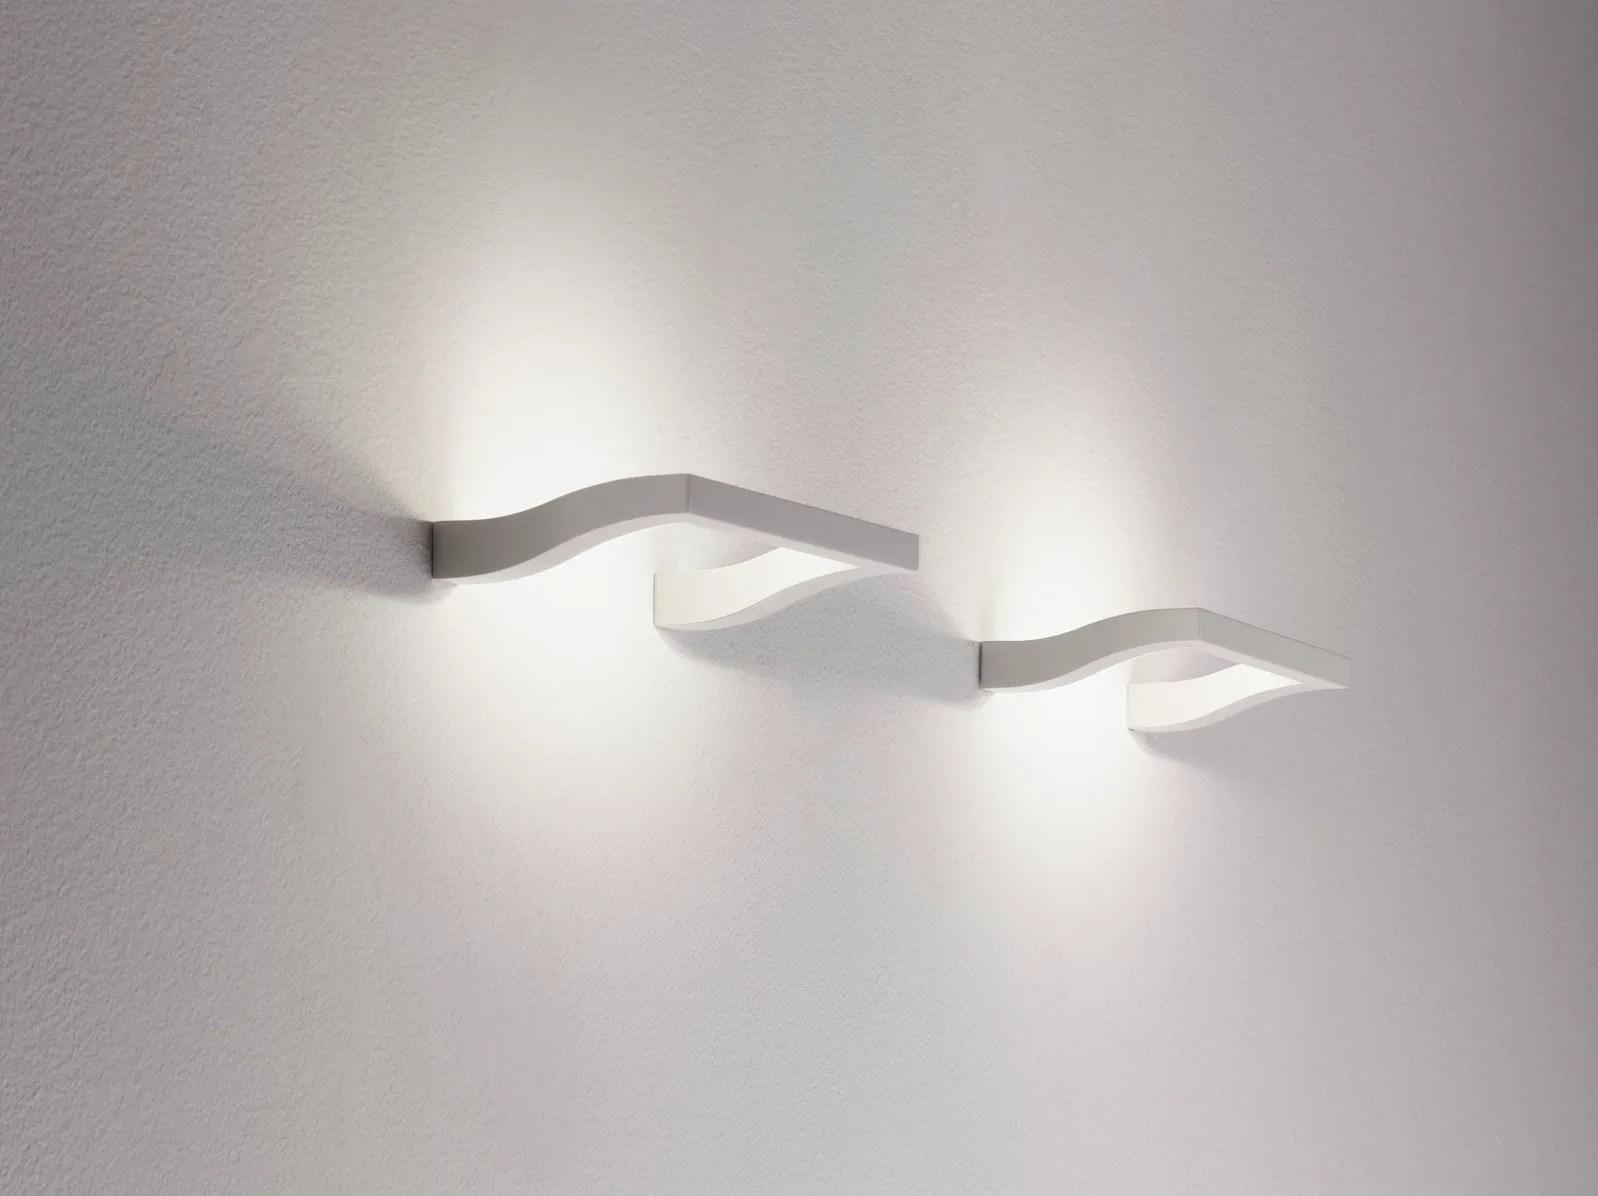 Plafoniere Per Garage A Led : Artemide plafoniere moderne specchio bagno cm specchiera